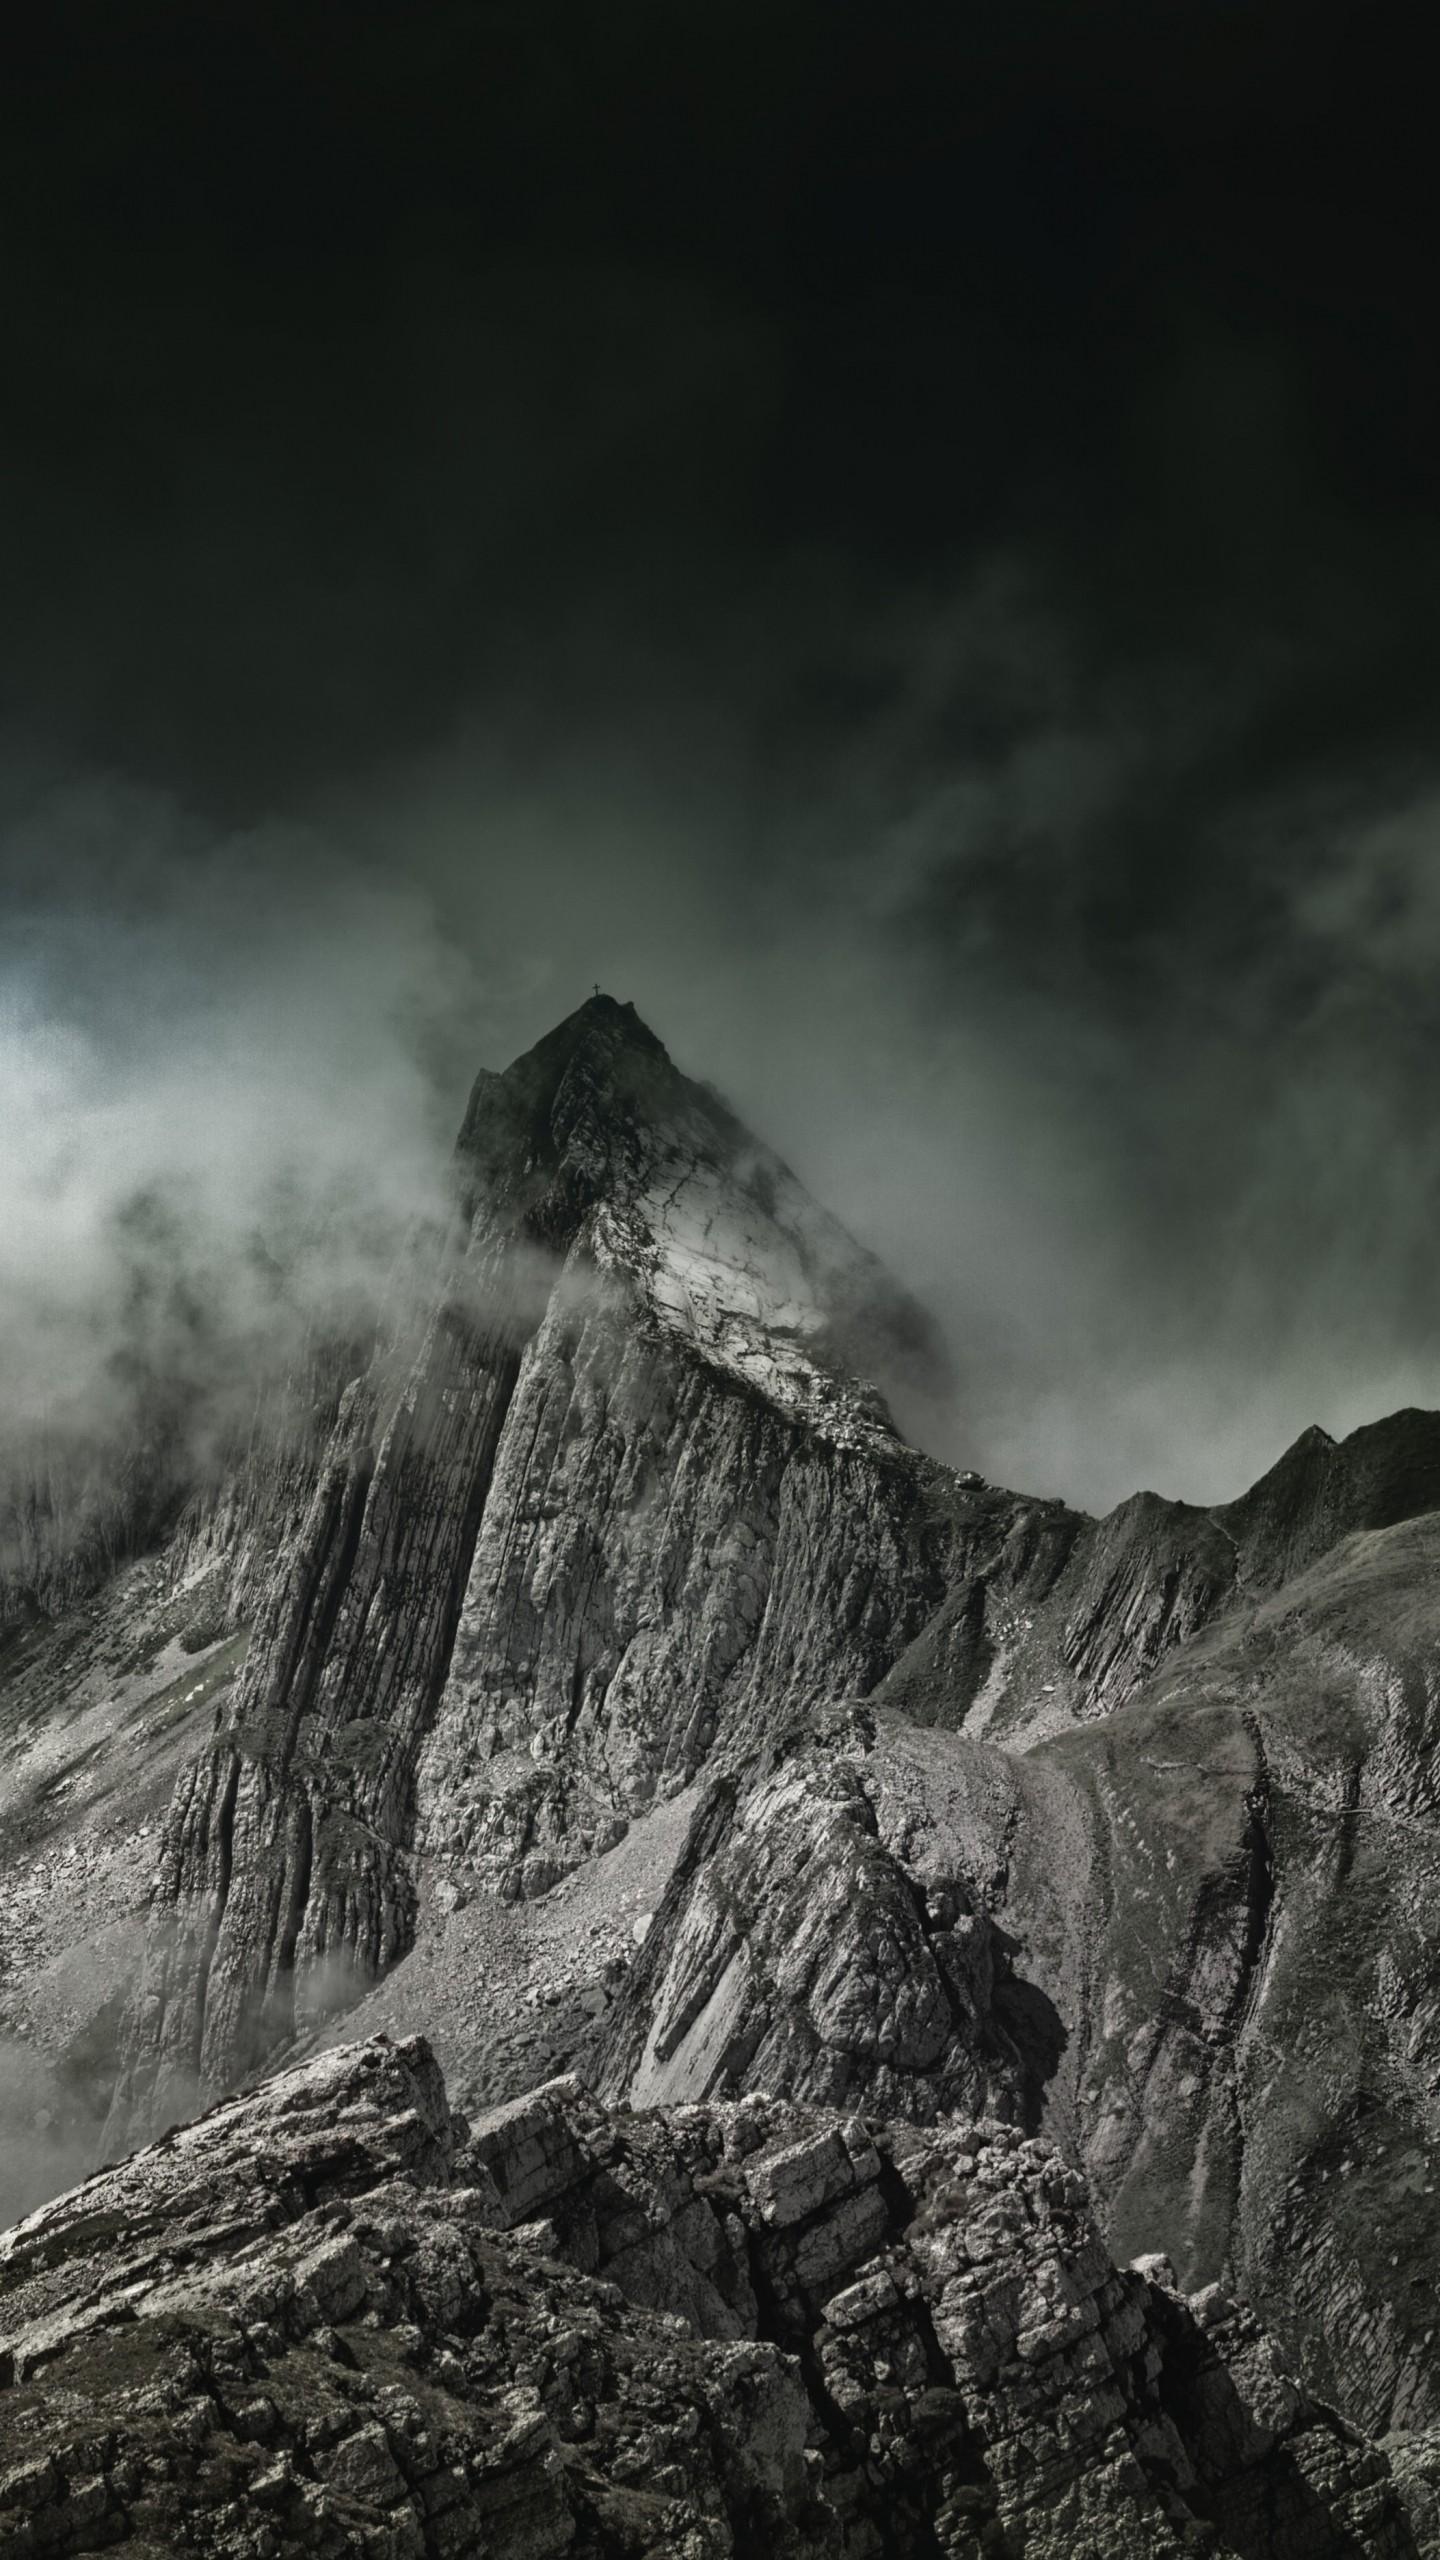 Amazing Wallpaper Mountain Fog - Mountains-Fog-Summit-Wallpaper-1440x2560  You Should Have_833538.jpg